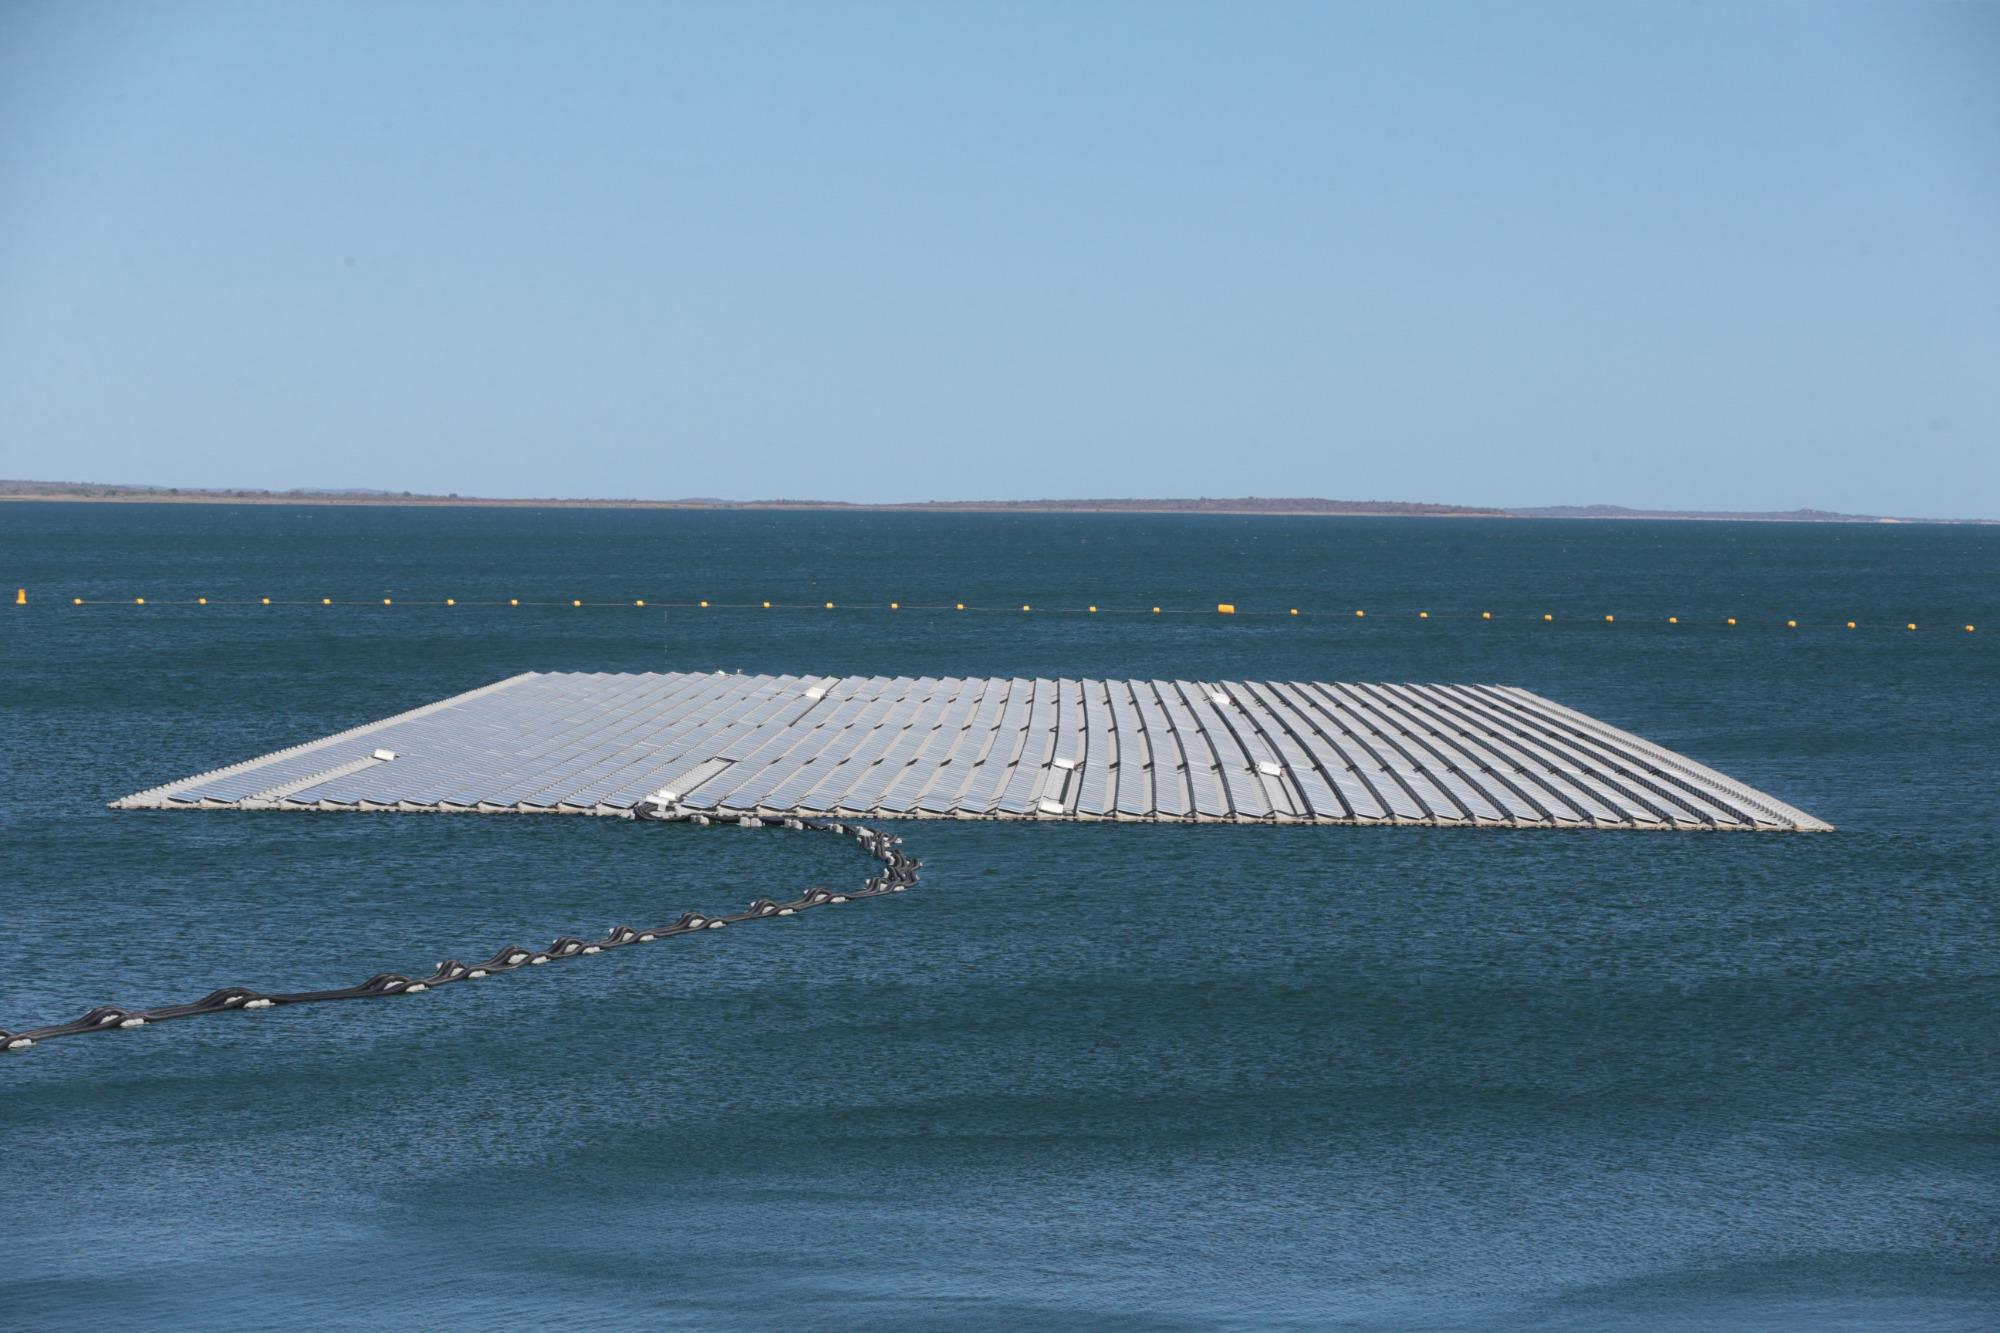 Nordeste inaugura usina solar flutuante